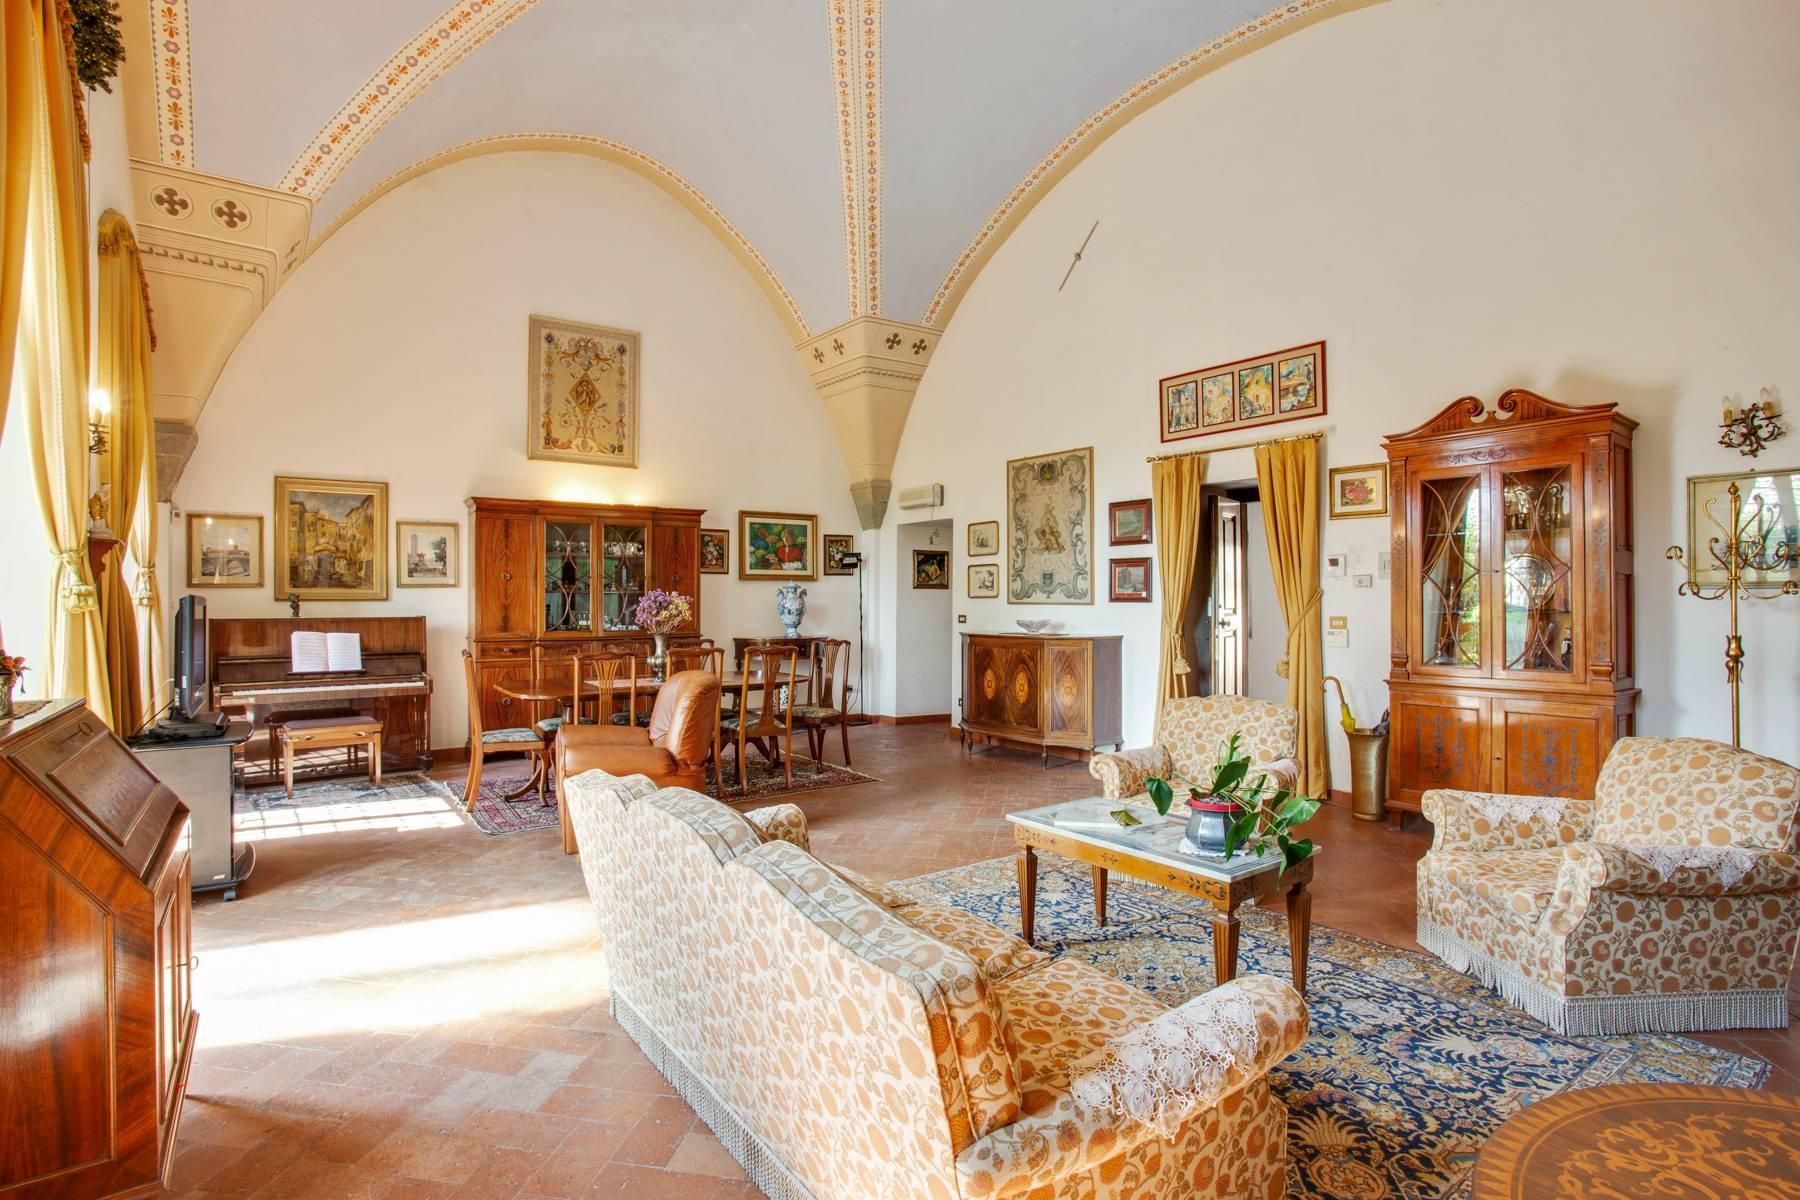 Wonderful apartment in historic villa of XVI century with garden - 1